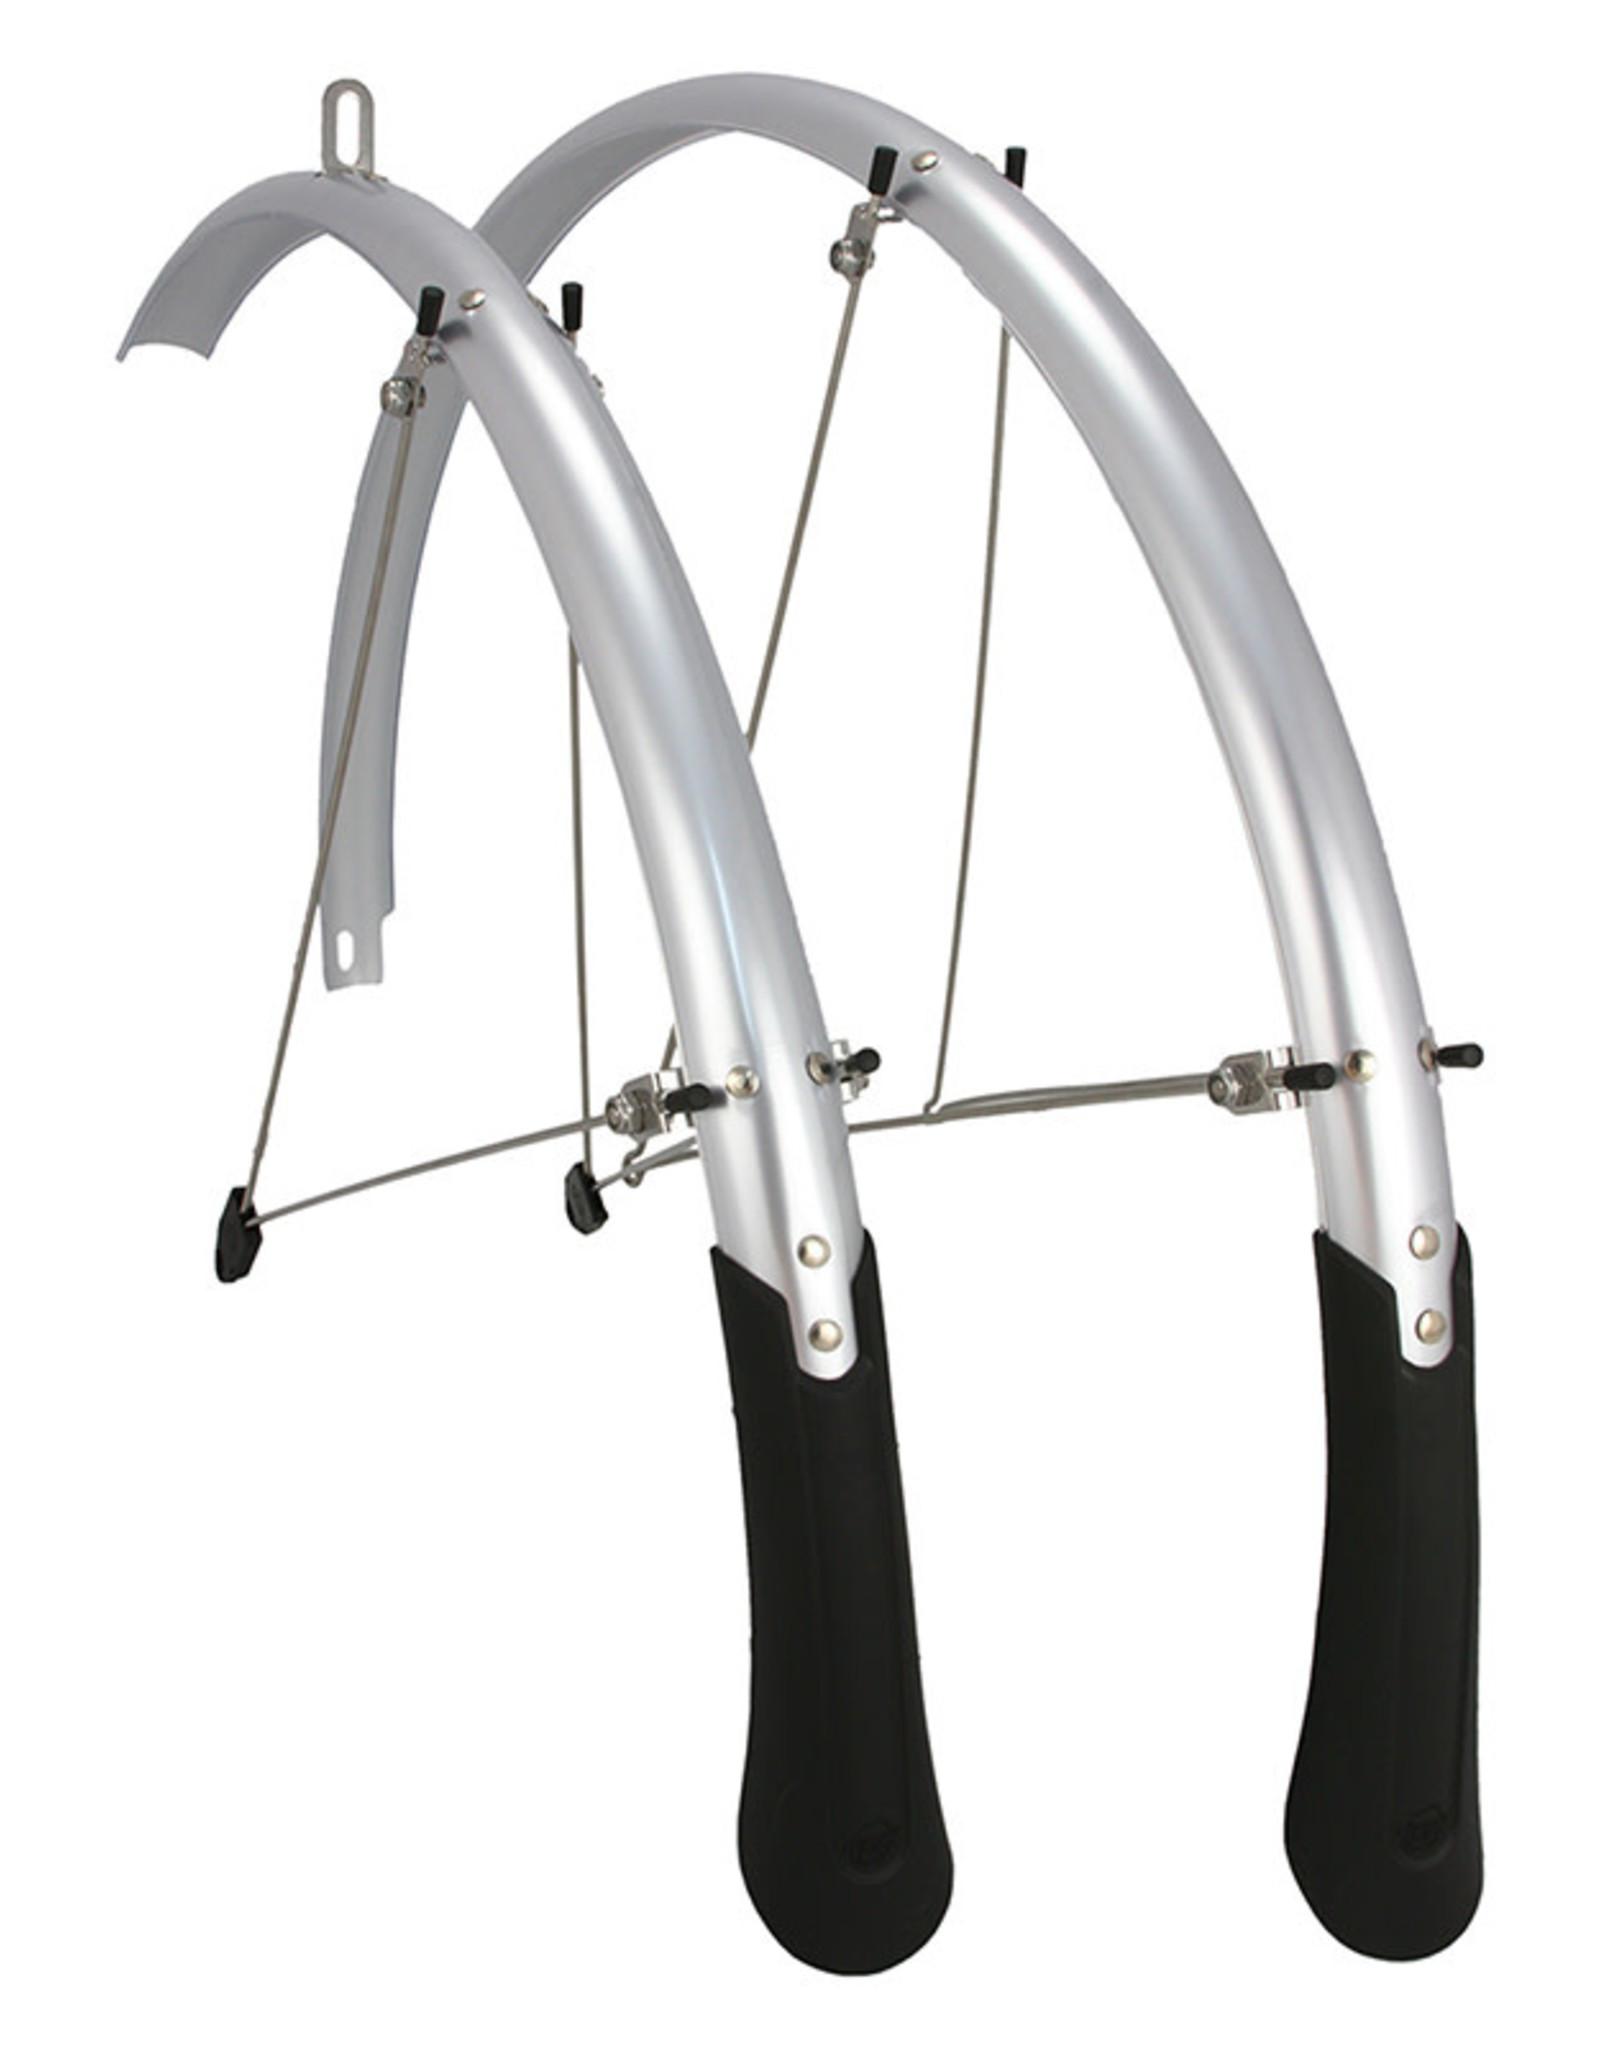 Planet Bike Cascadia Fenders 35mm (Tire Sizes 700 x 18-25) Road Silver